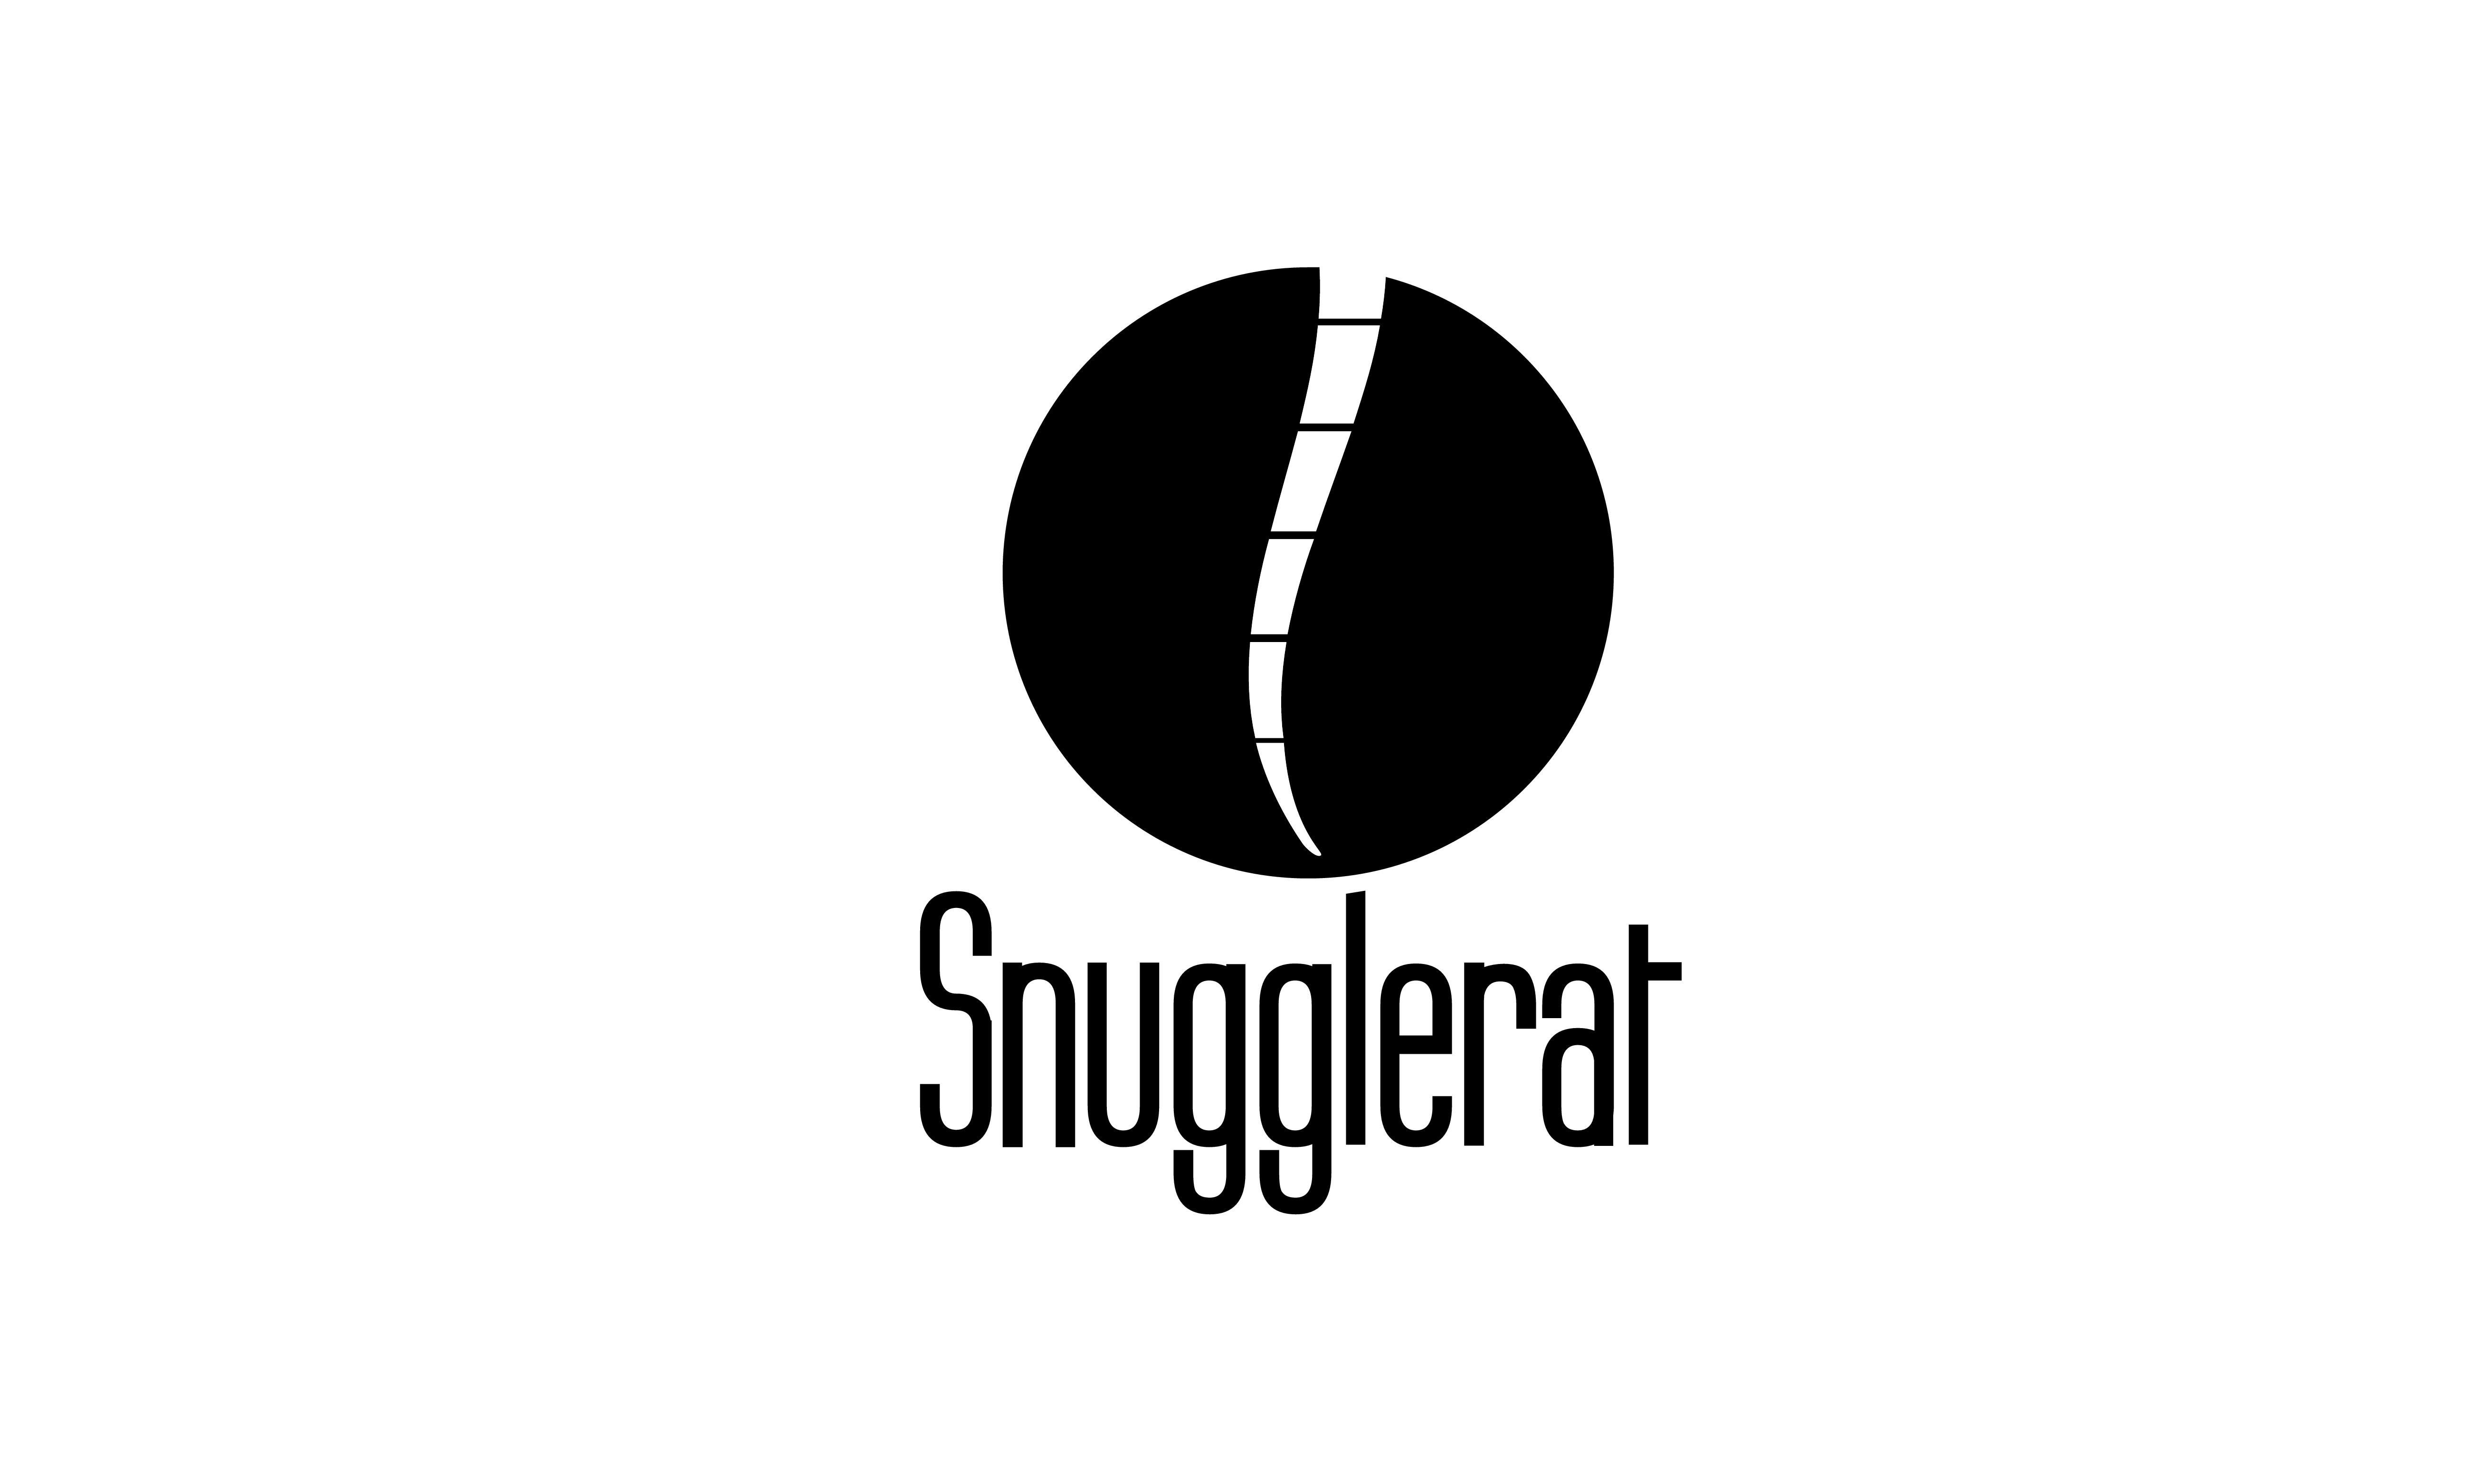 Snugglerat needs a logo! Create the visual signature for a new apparel brand.